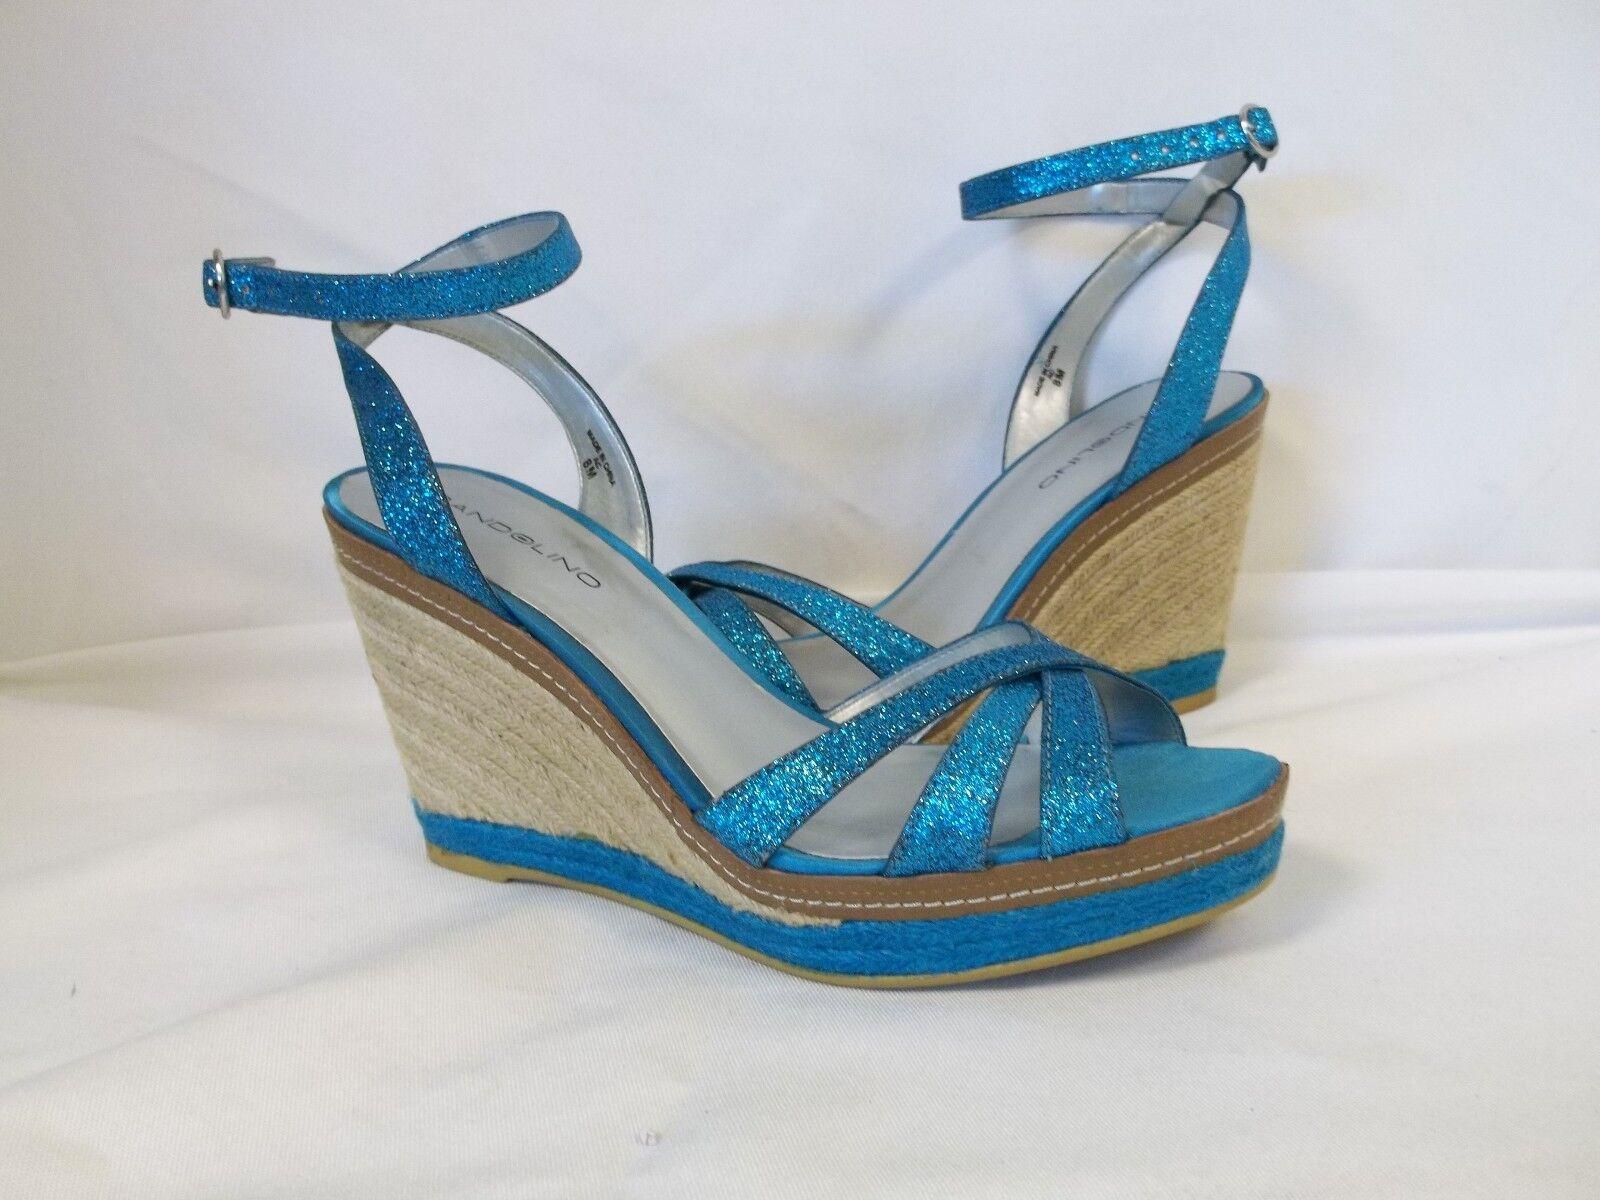 Bandolino 8 M Kahlia bleu Glitter Open Toe Wedges New femmes chaussures NWOB